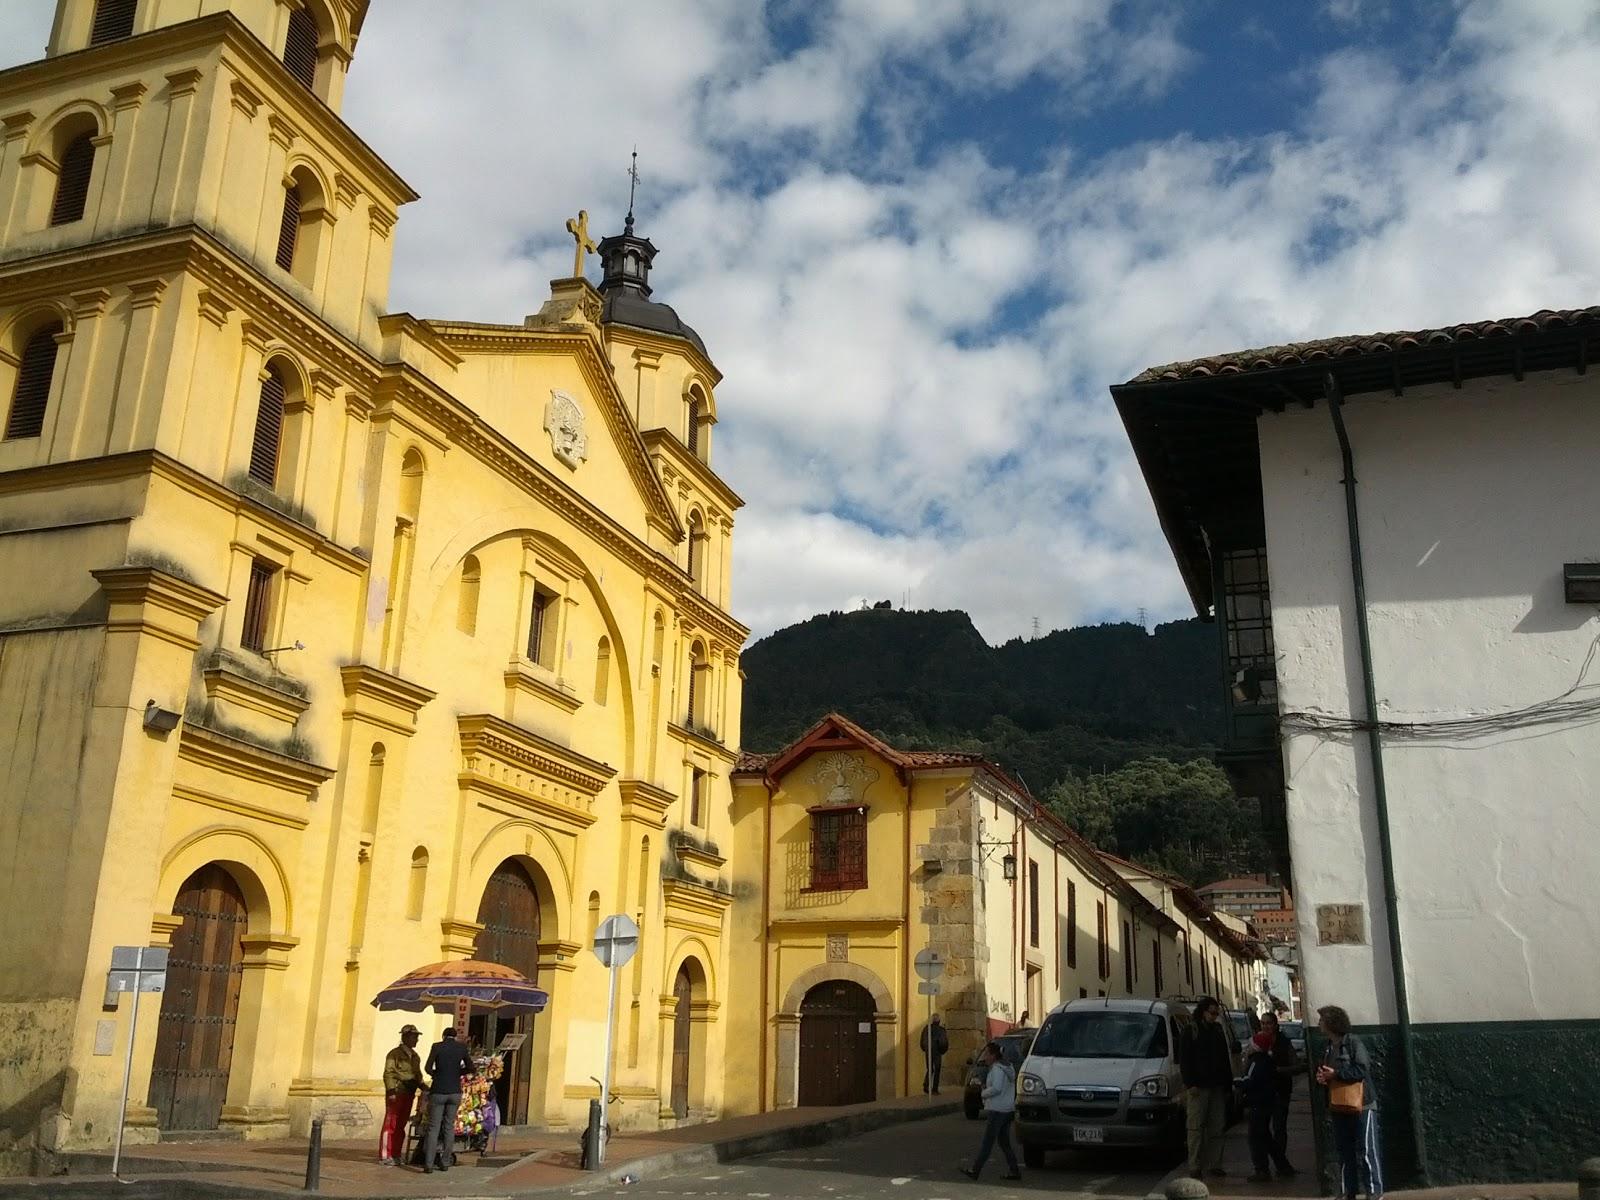 La Candelaria, the colonial historical centre in Bogota